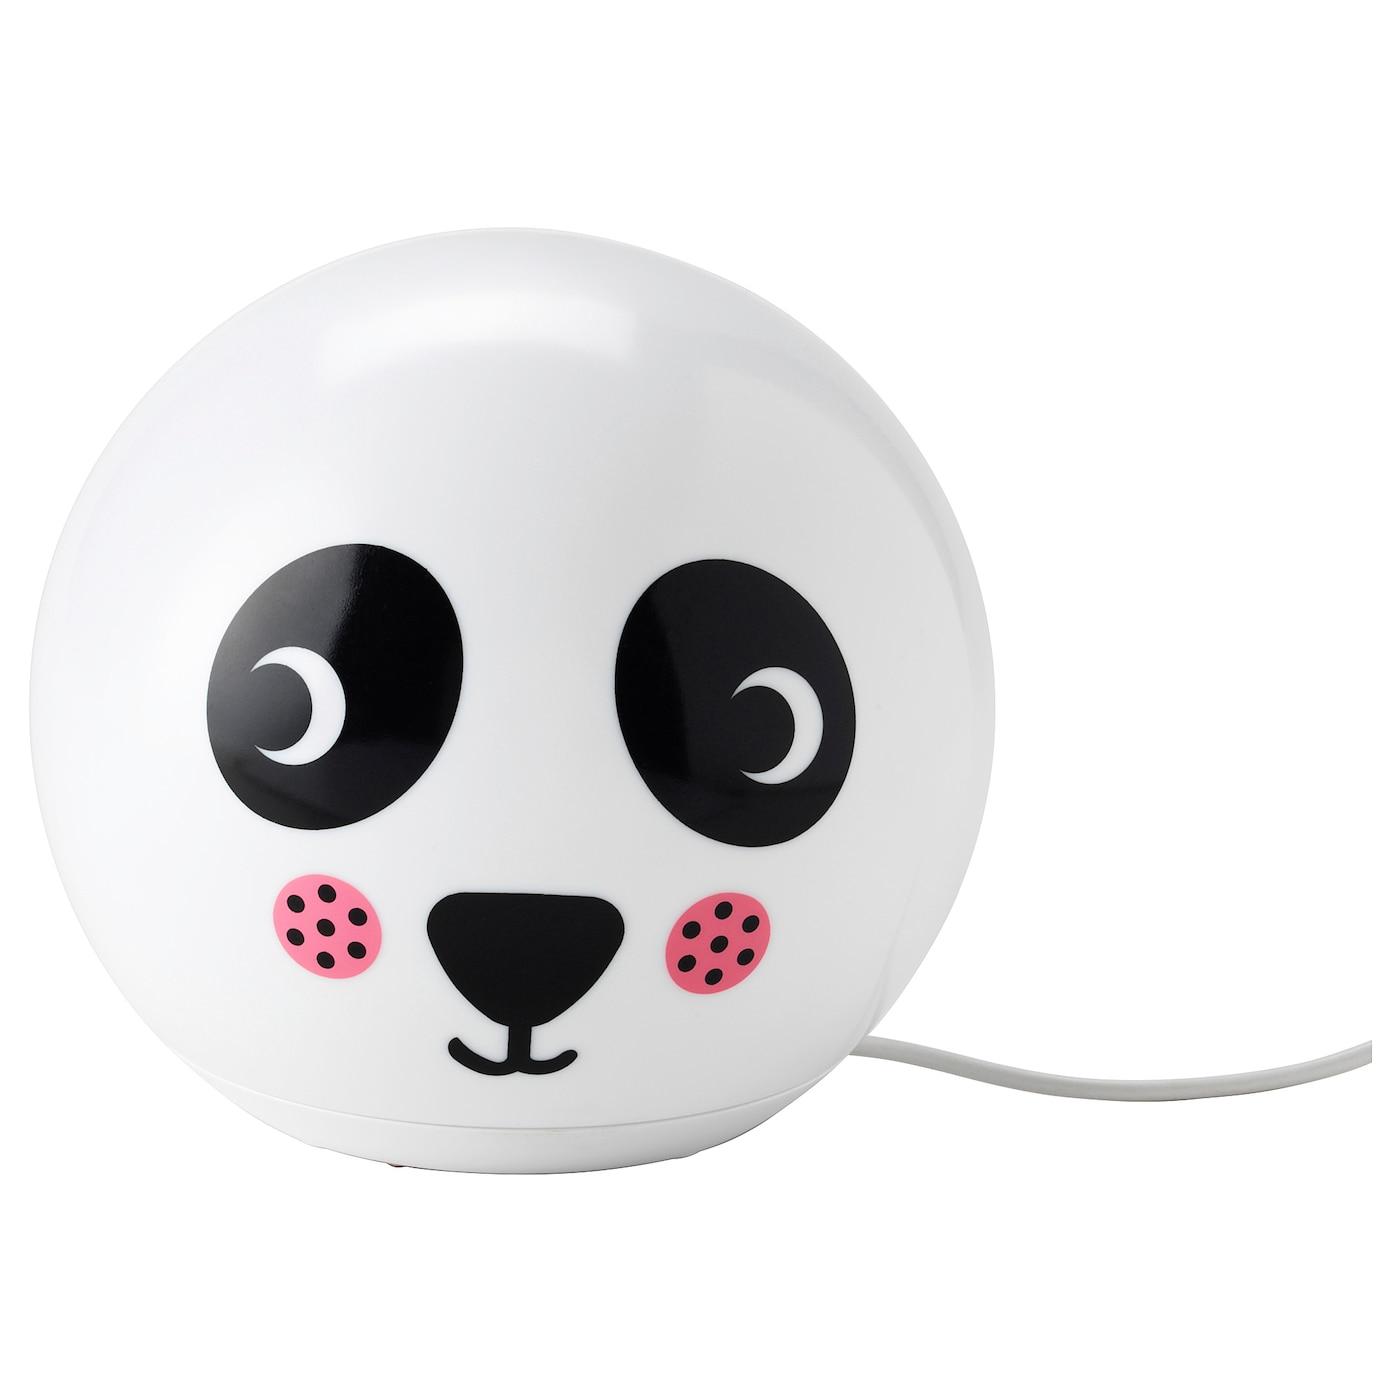 ÄNGARNA Tischleuchte, LED - Pandamuster